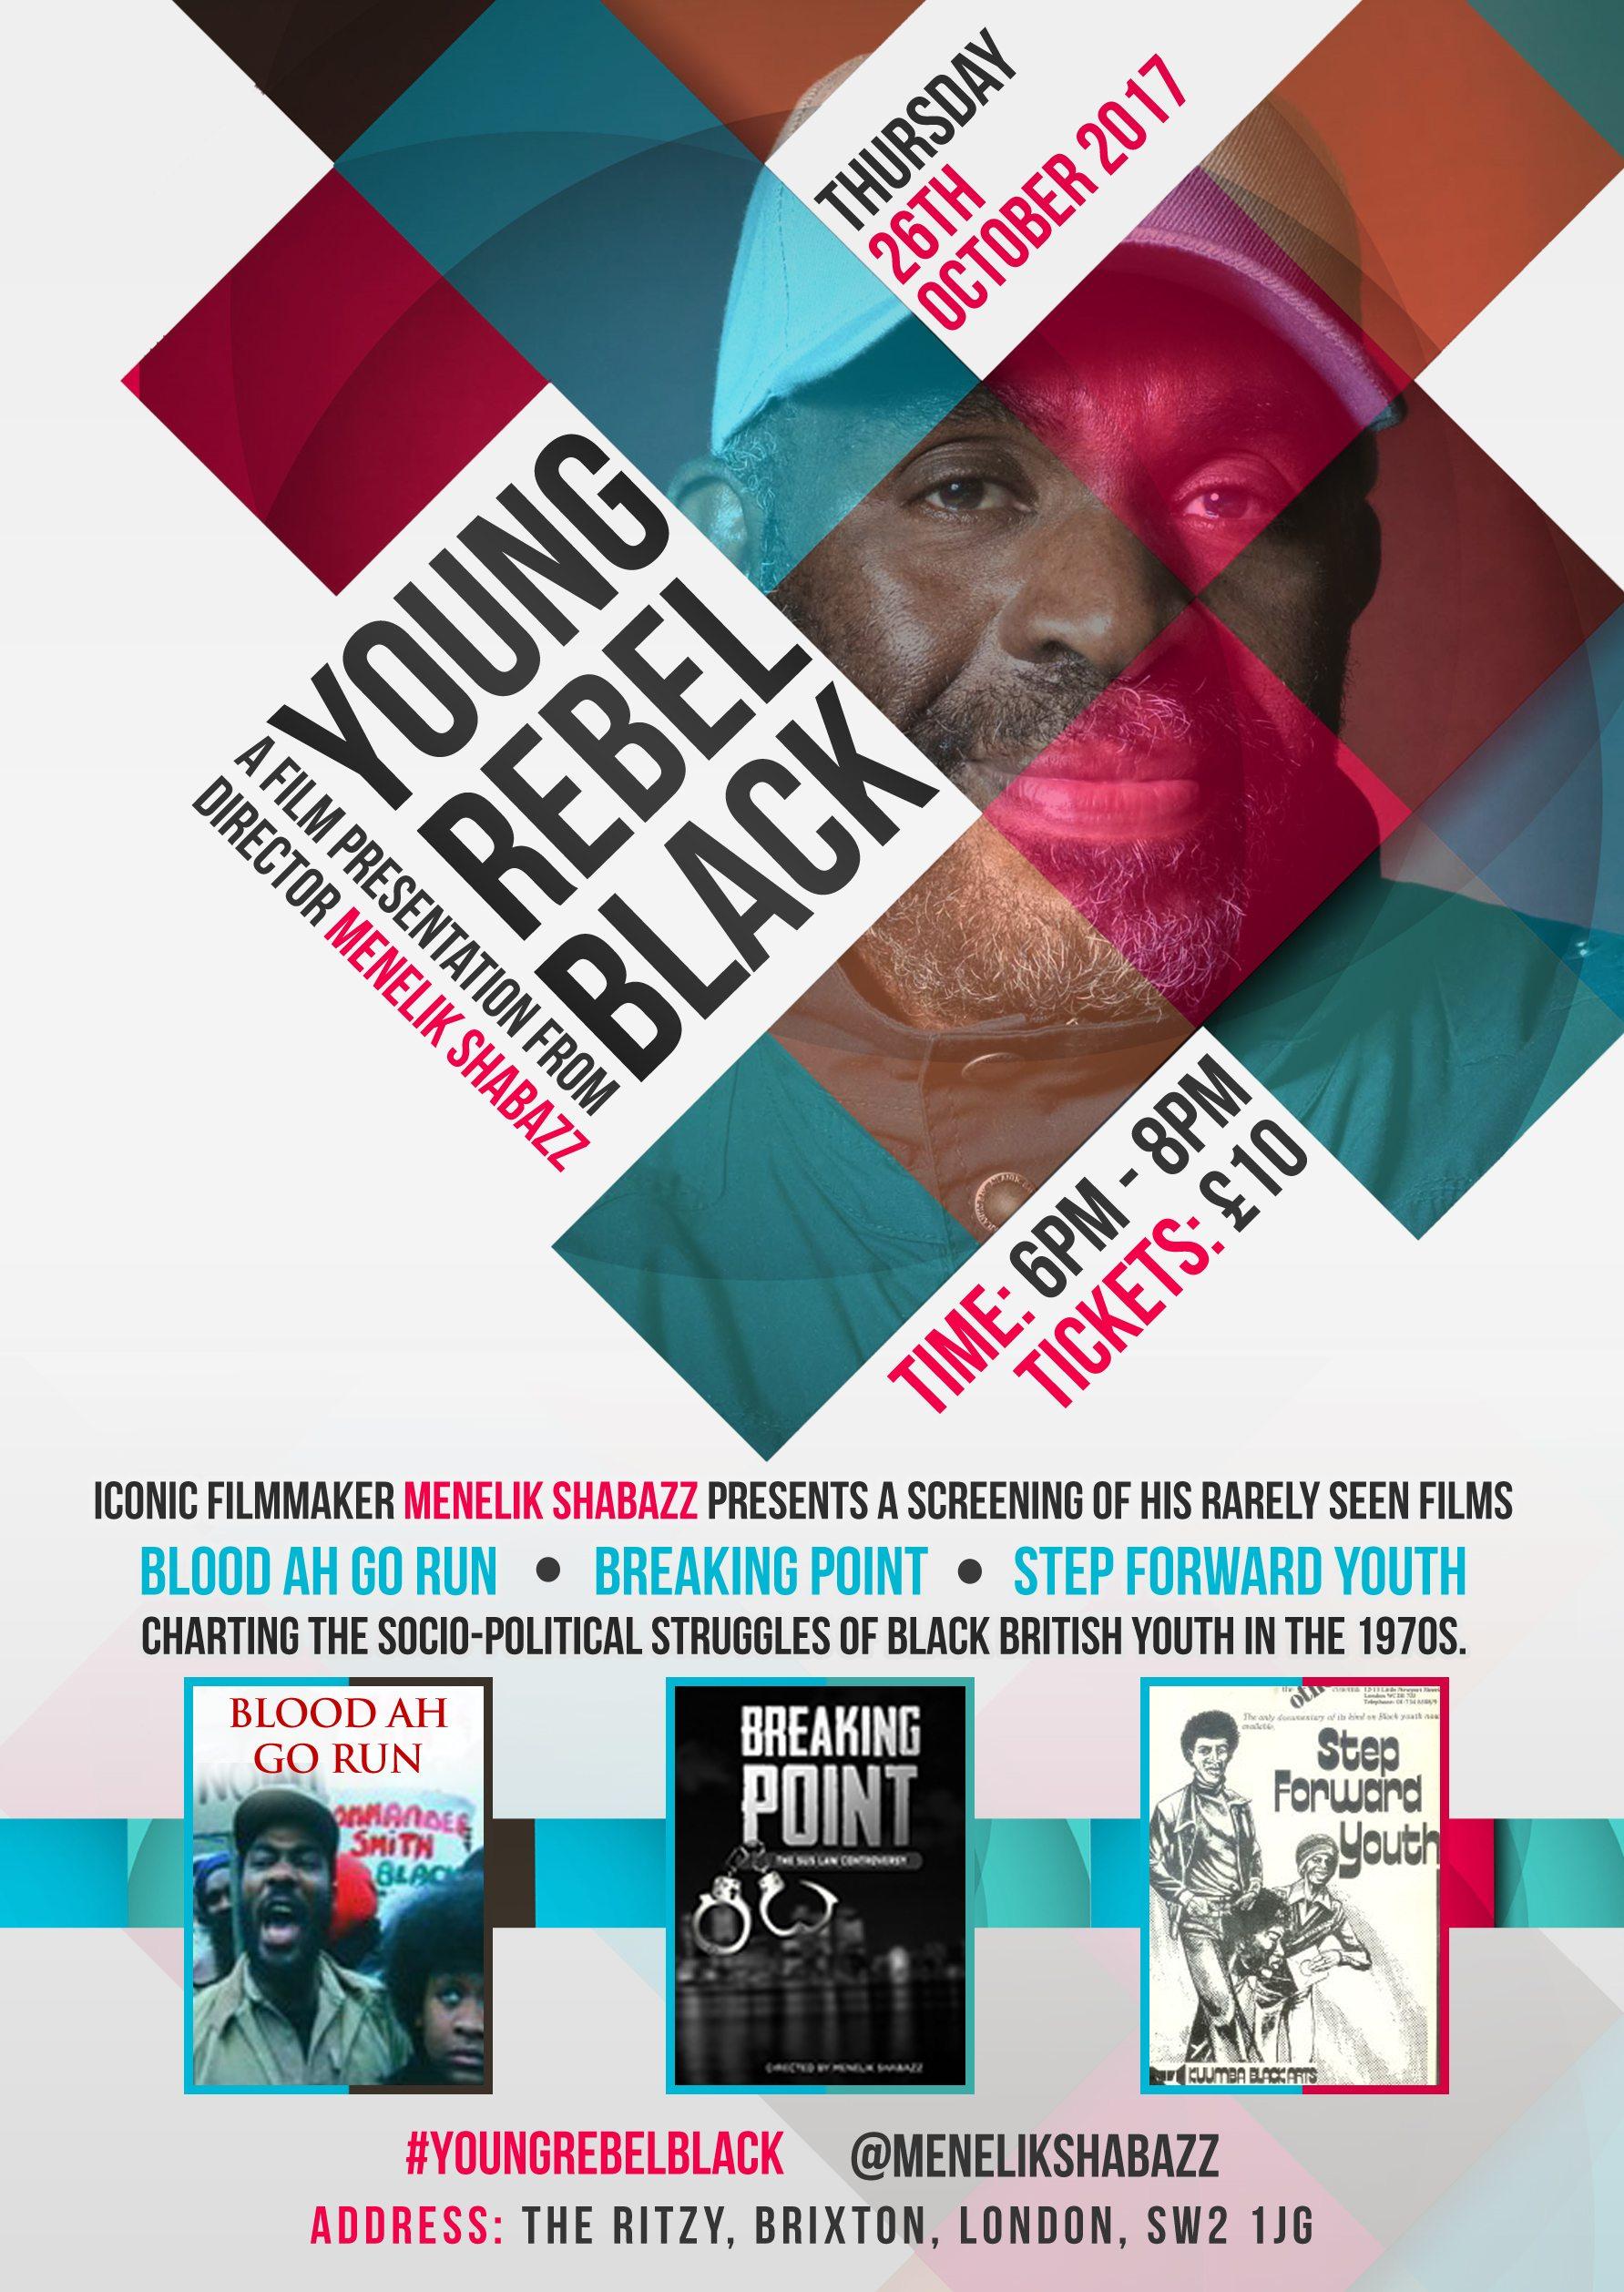 YOUNG REBEL AND BLACK: Filmmaker Menelik Shabazz Presents His Rarely Seen Films | Blacknet UK